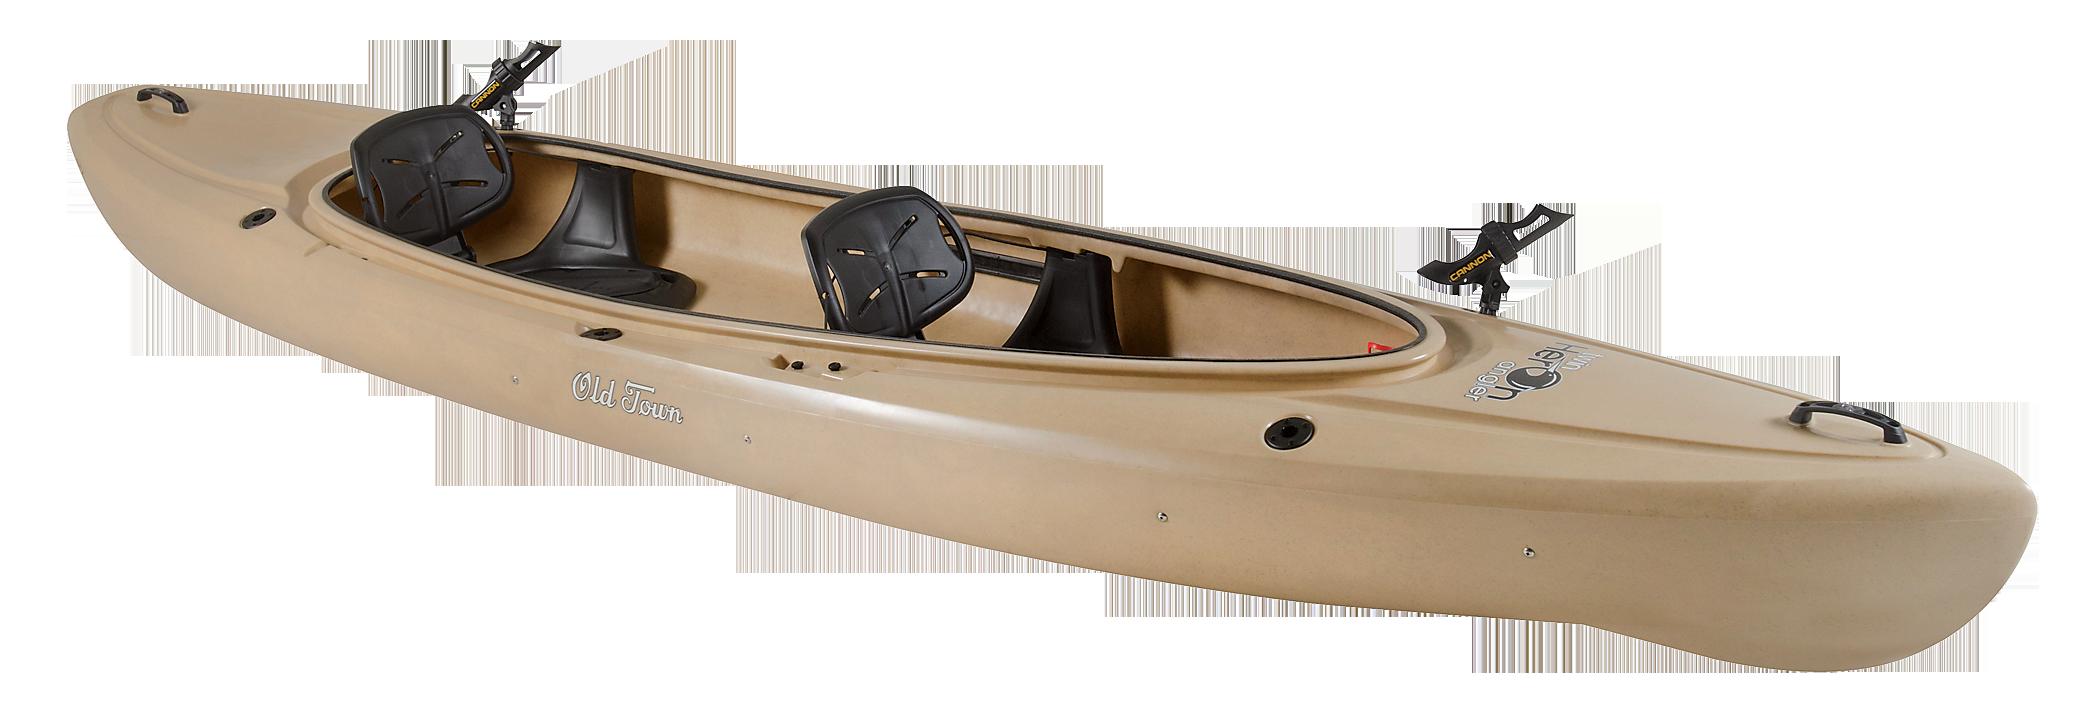 Tandem Recreational Kayaks